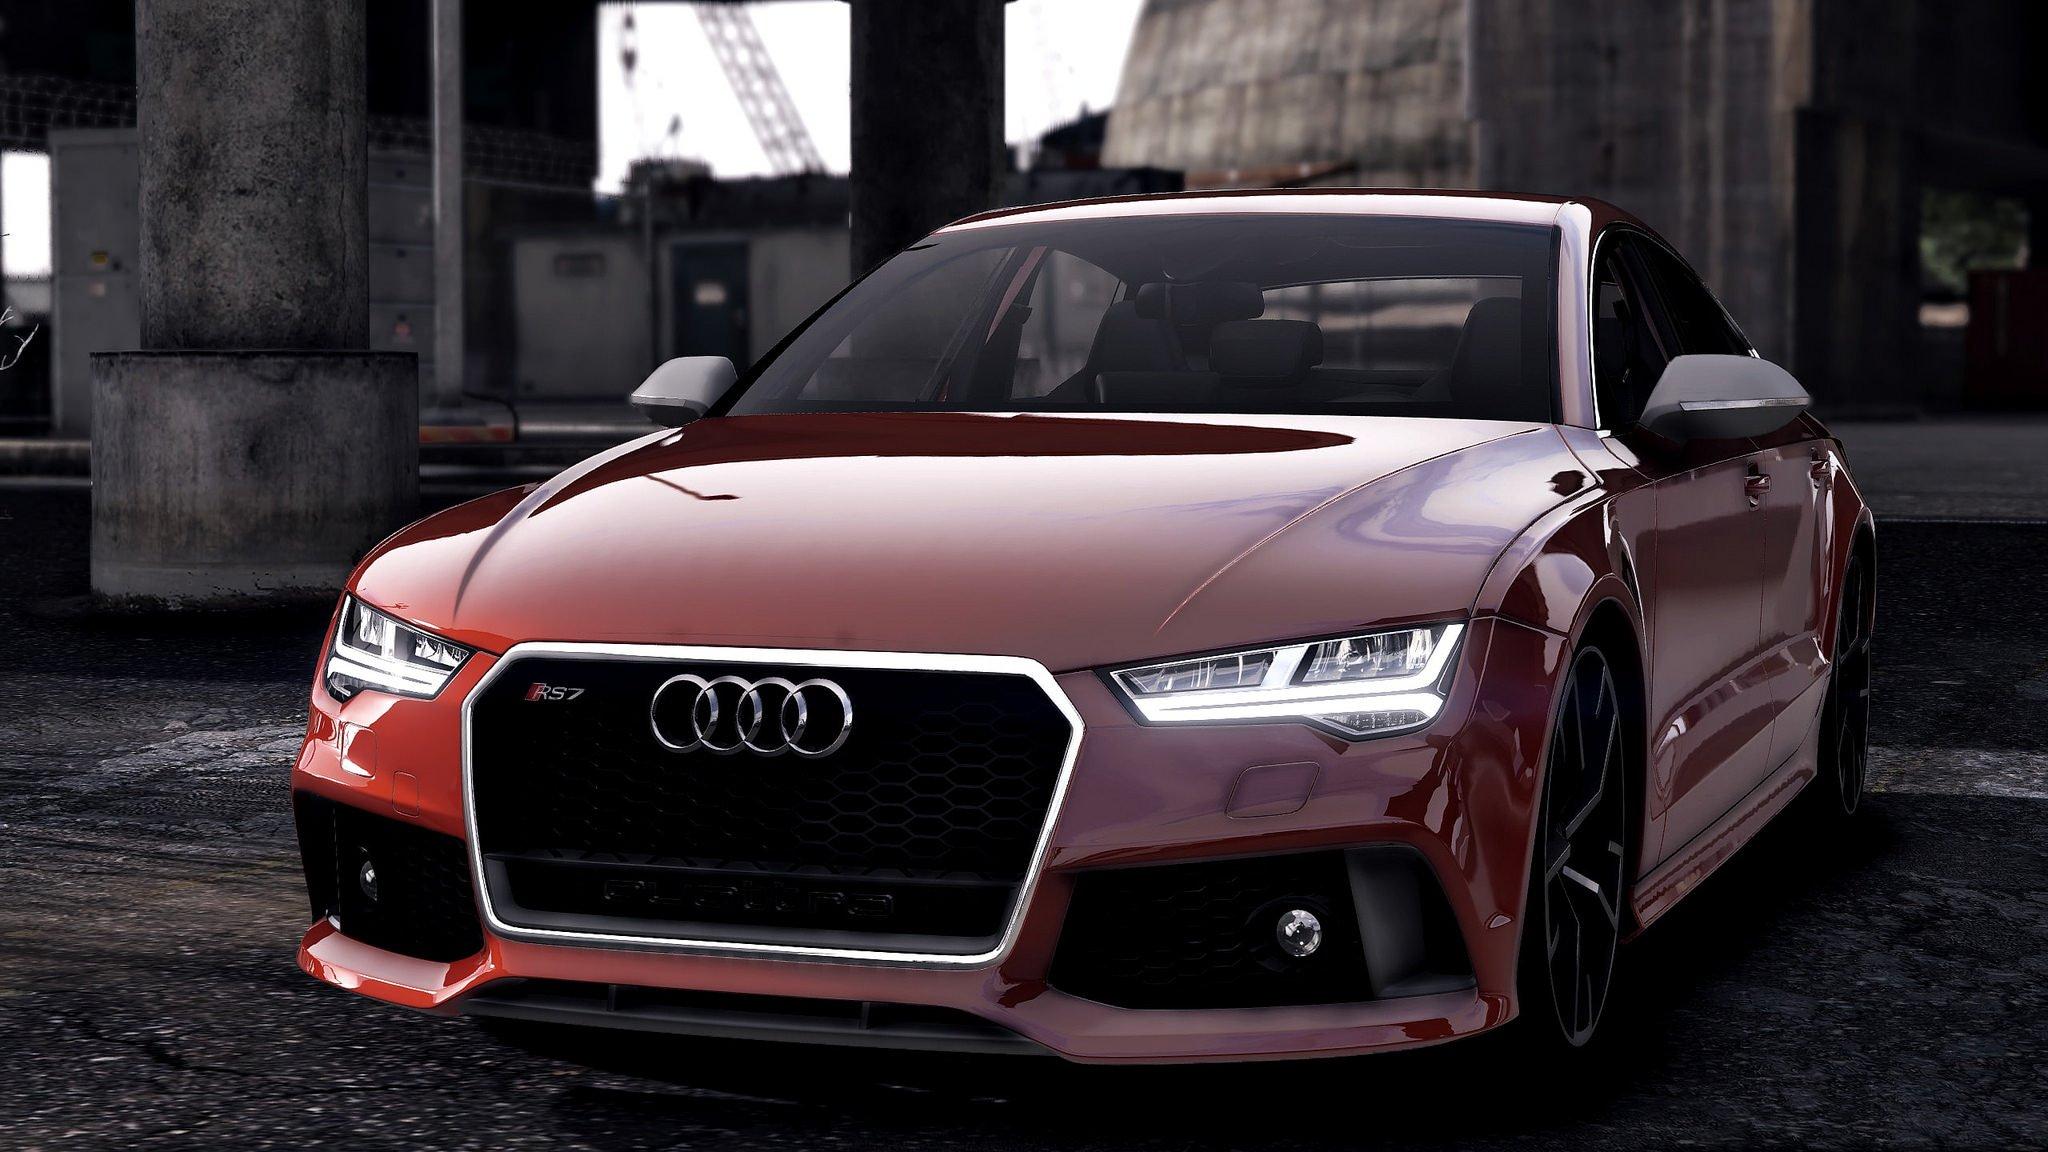 Audi RS7 Sportback [Add-On / Replace] - GTA5-Mods.com